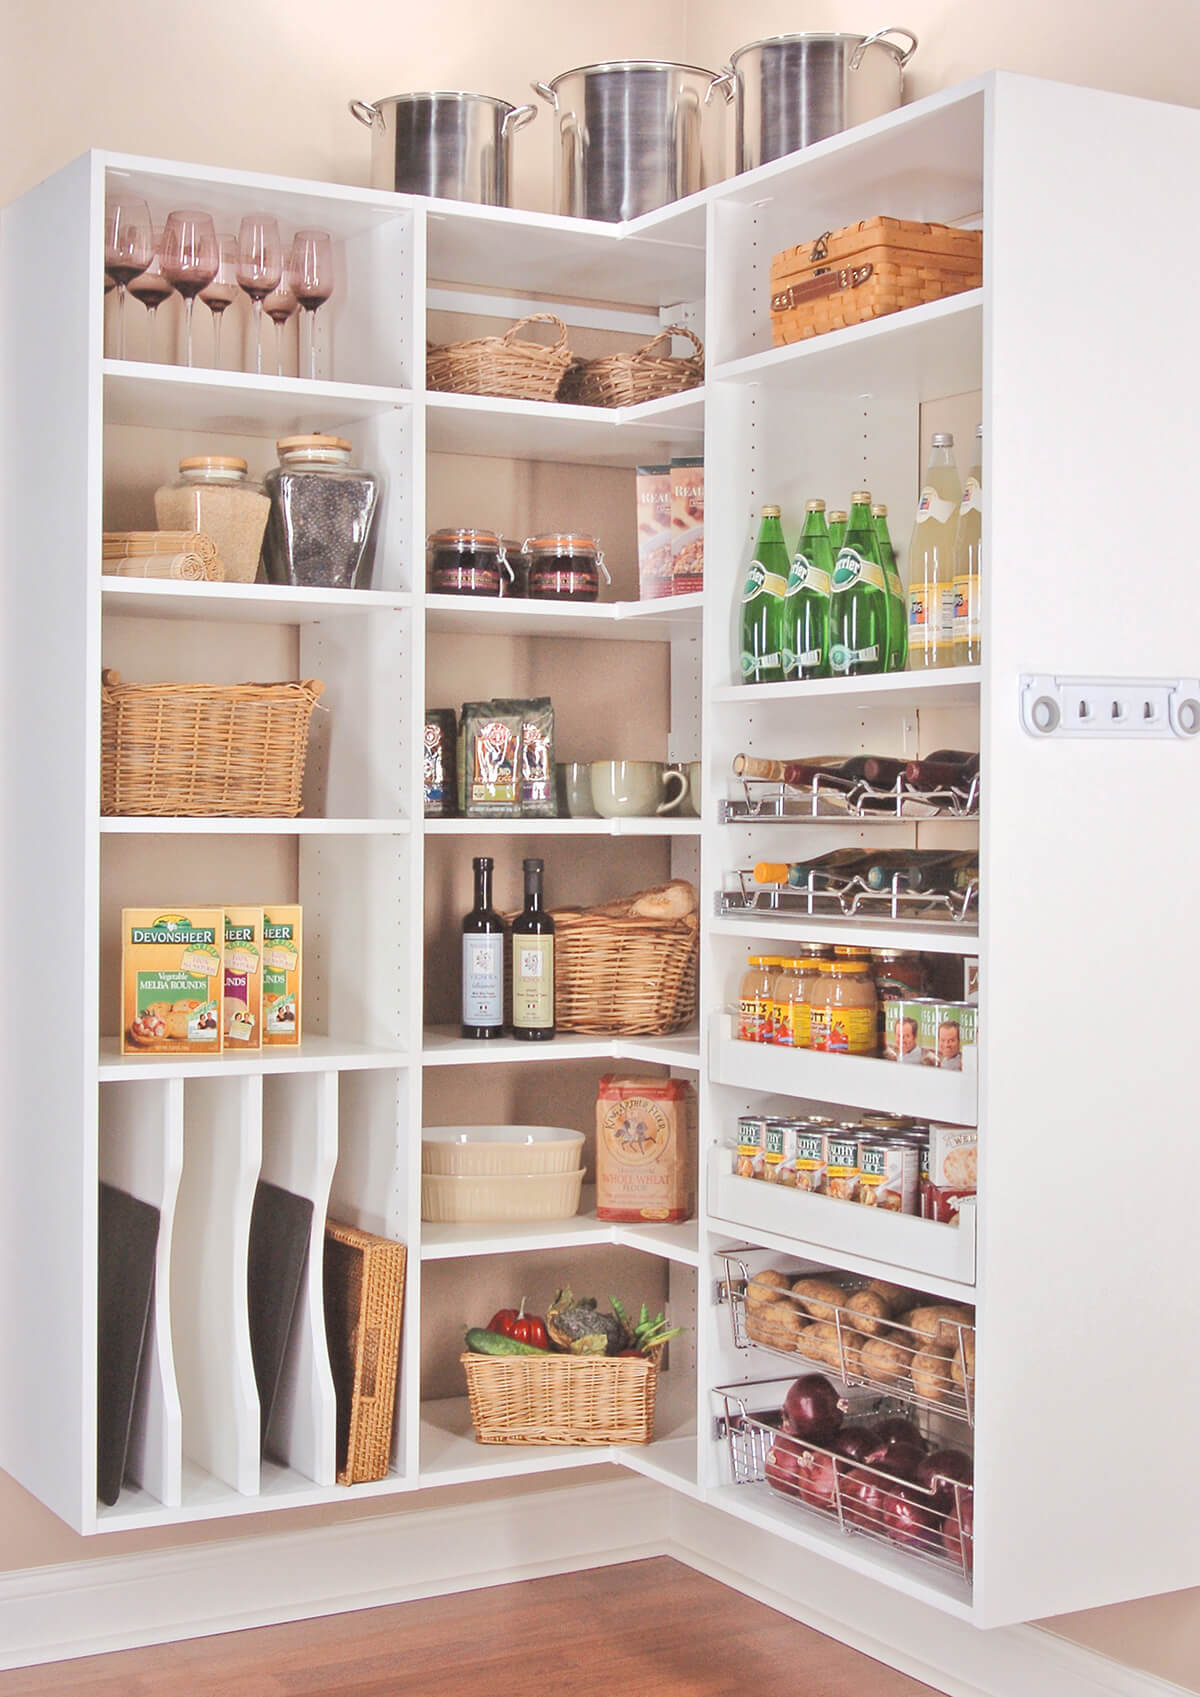 Corner Storage Idea for the Pantry